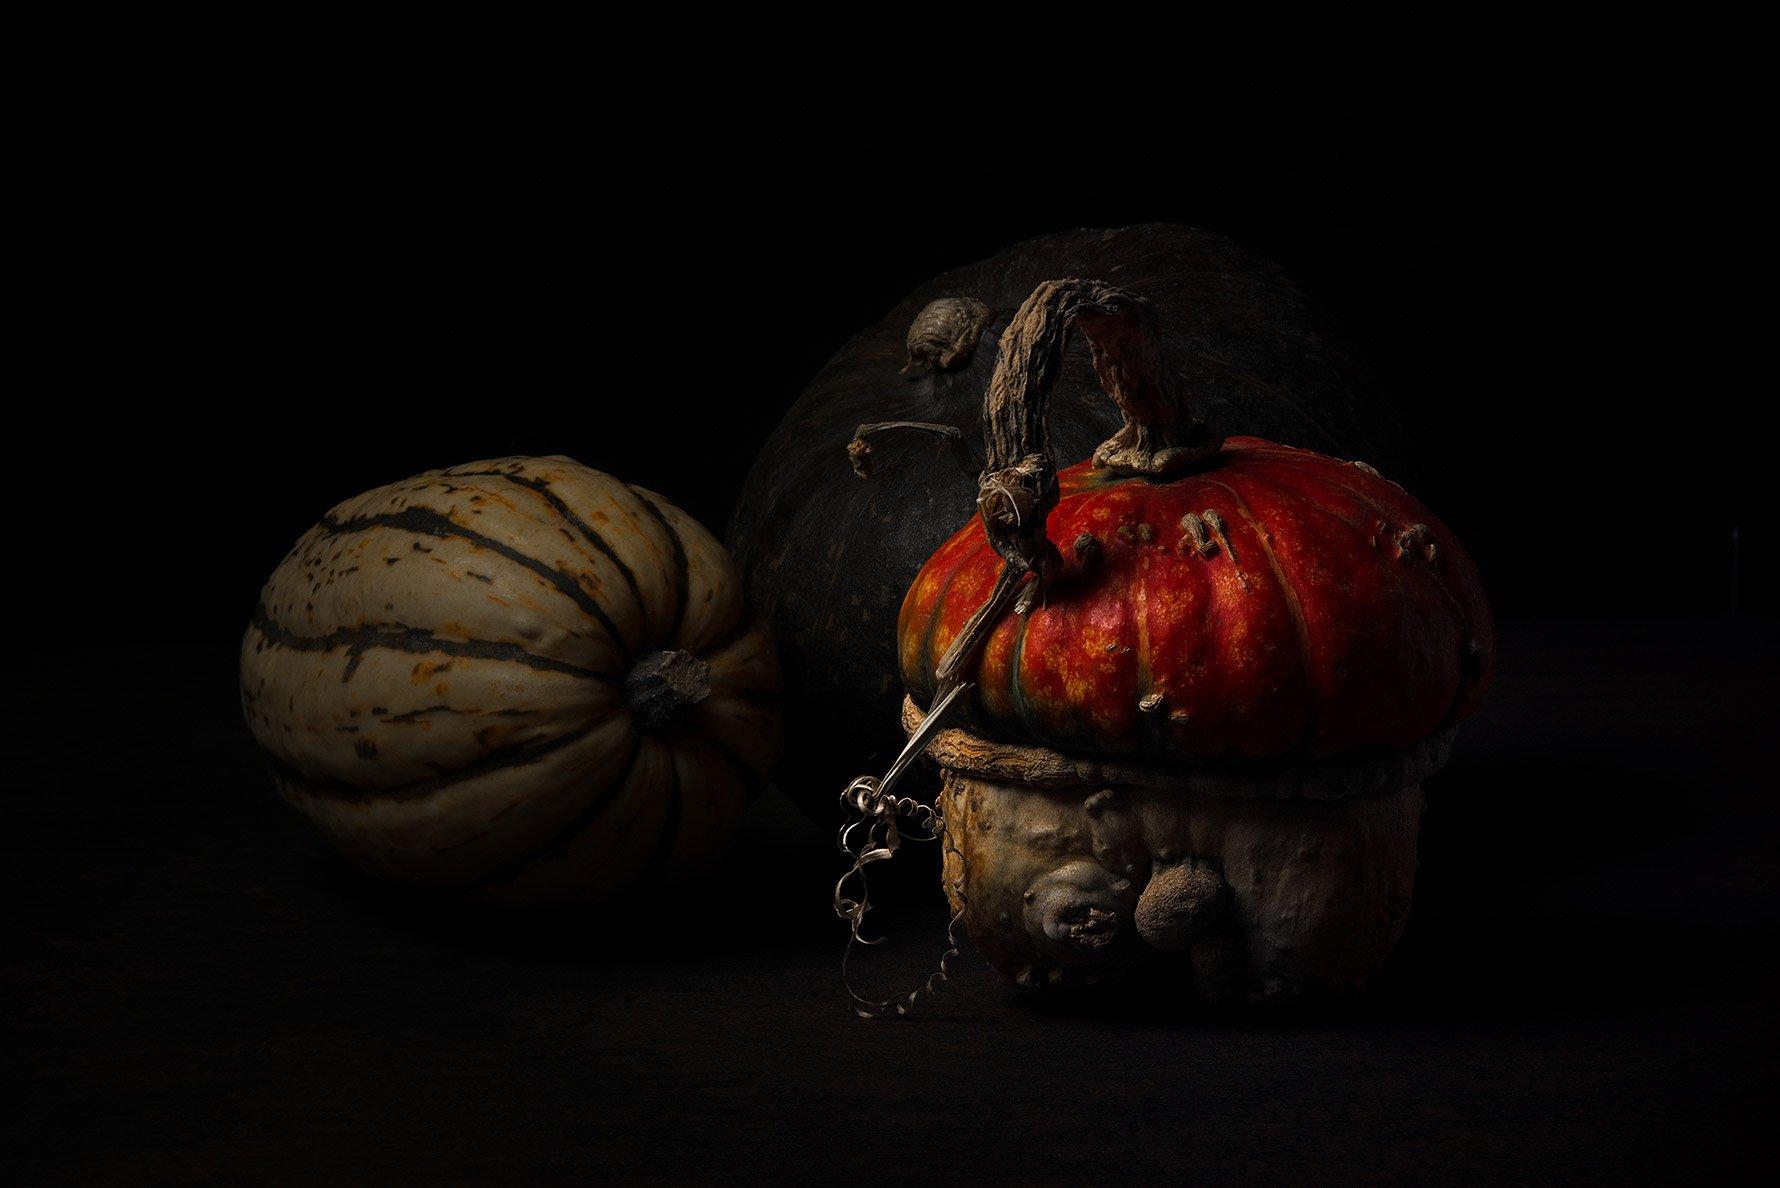 food, kitchen, old, vagetable, LESCHALLIER-PERSONAL ART